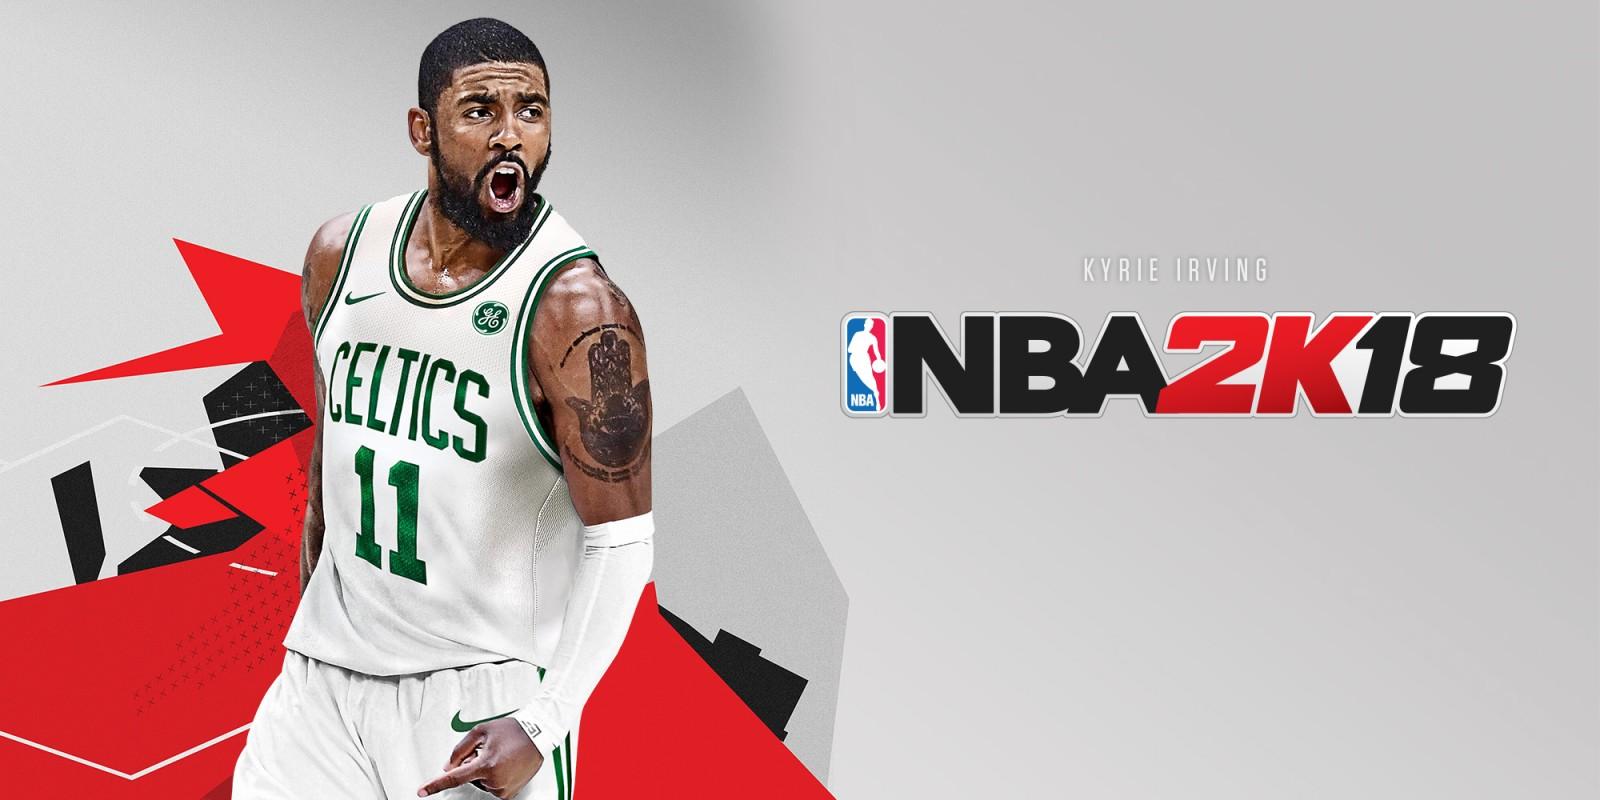 NBA 2K18 Cover دانلود NBA 2K18 35.0.1 – بازی بسکتبال ان بی ای 2018 آندروید + مود + دیتا